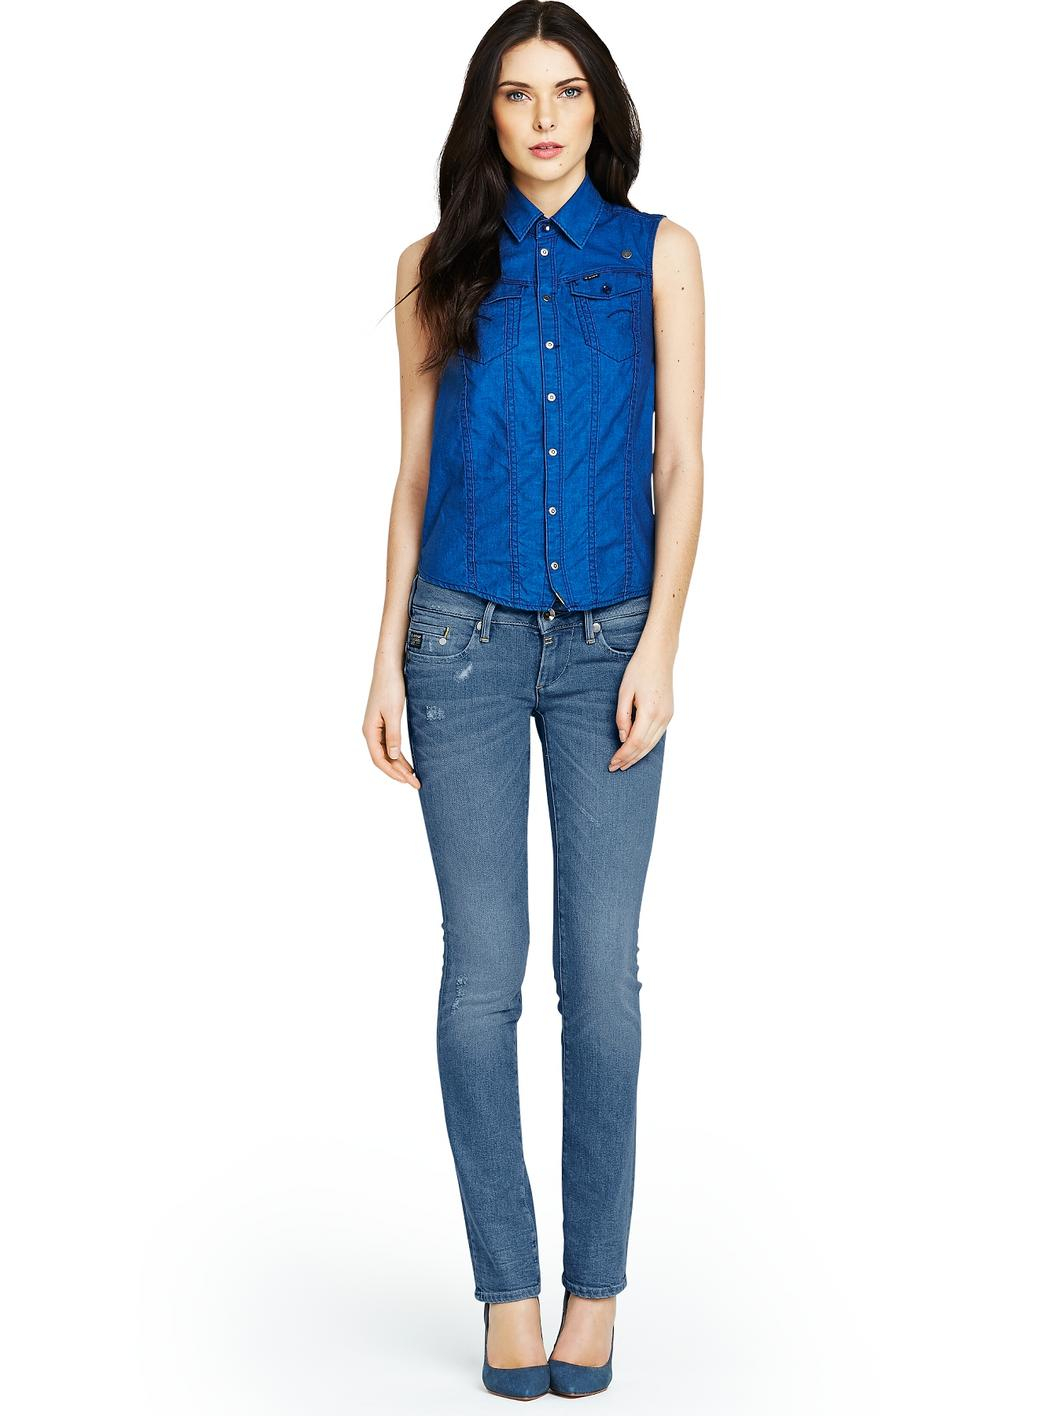 g star raw midge straight leg jeans in blue medium aged lyst. Black Bedroom Furniture Sets. Home Design Ideas